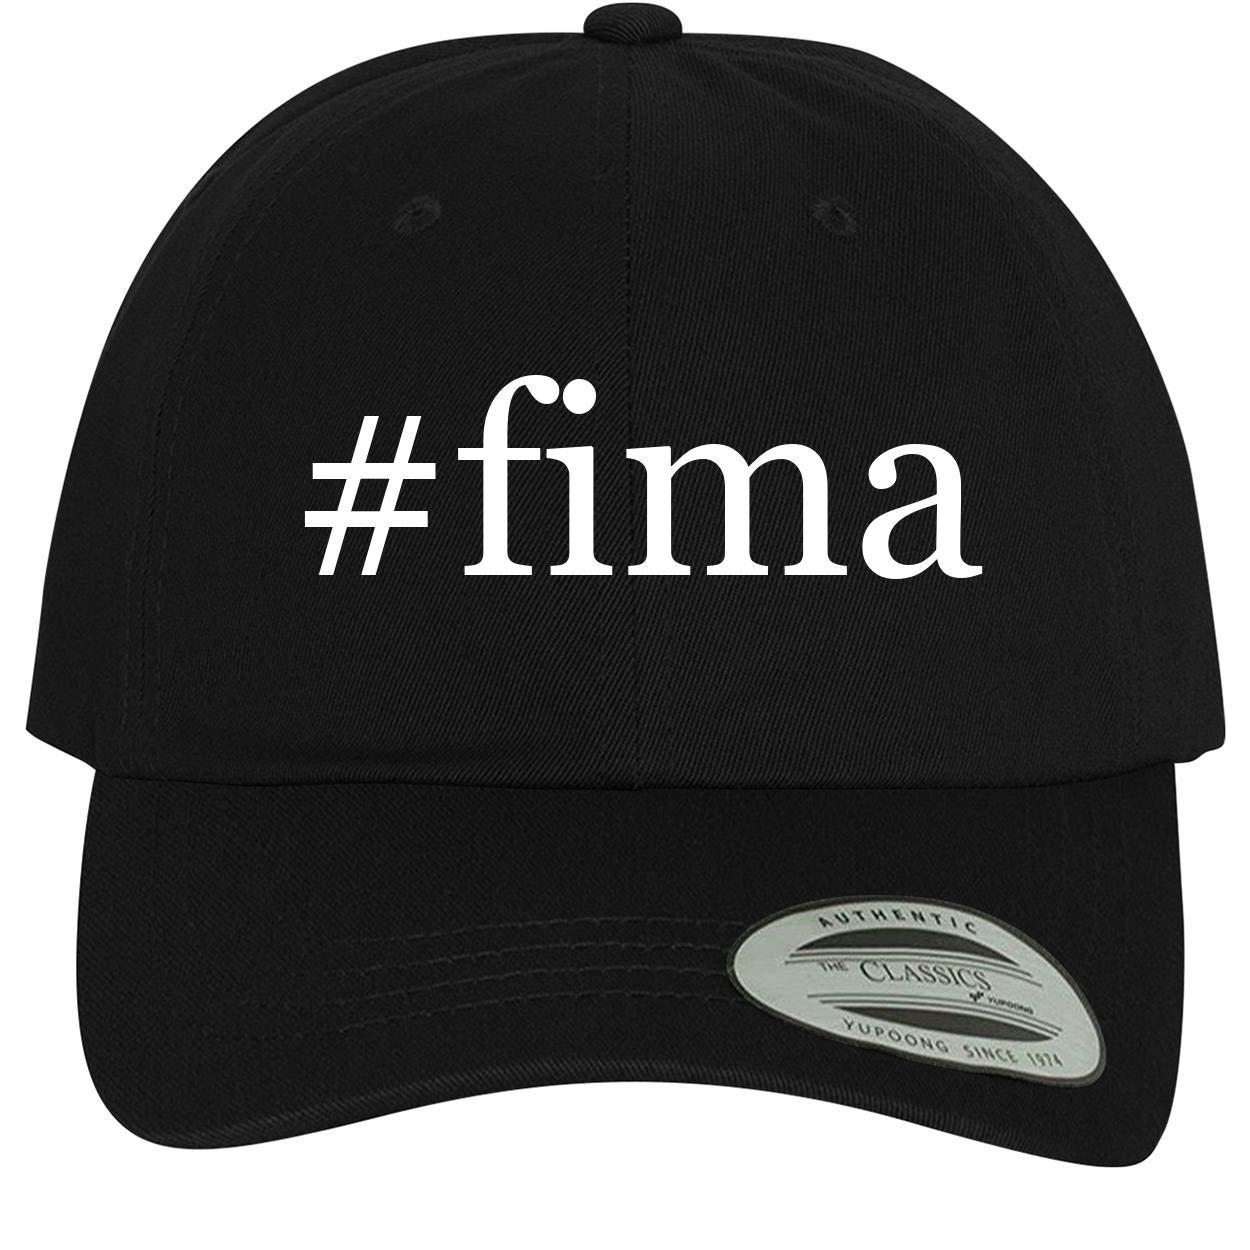 Comfortable Dad Hat Baseball Cap BH Cool Designs #FIMA